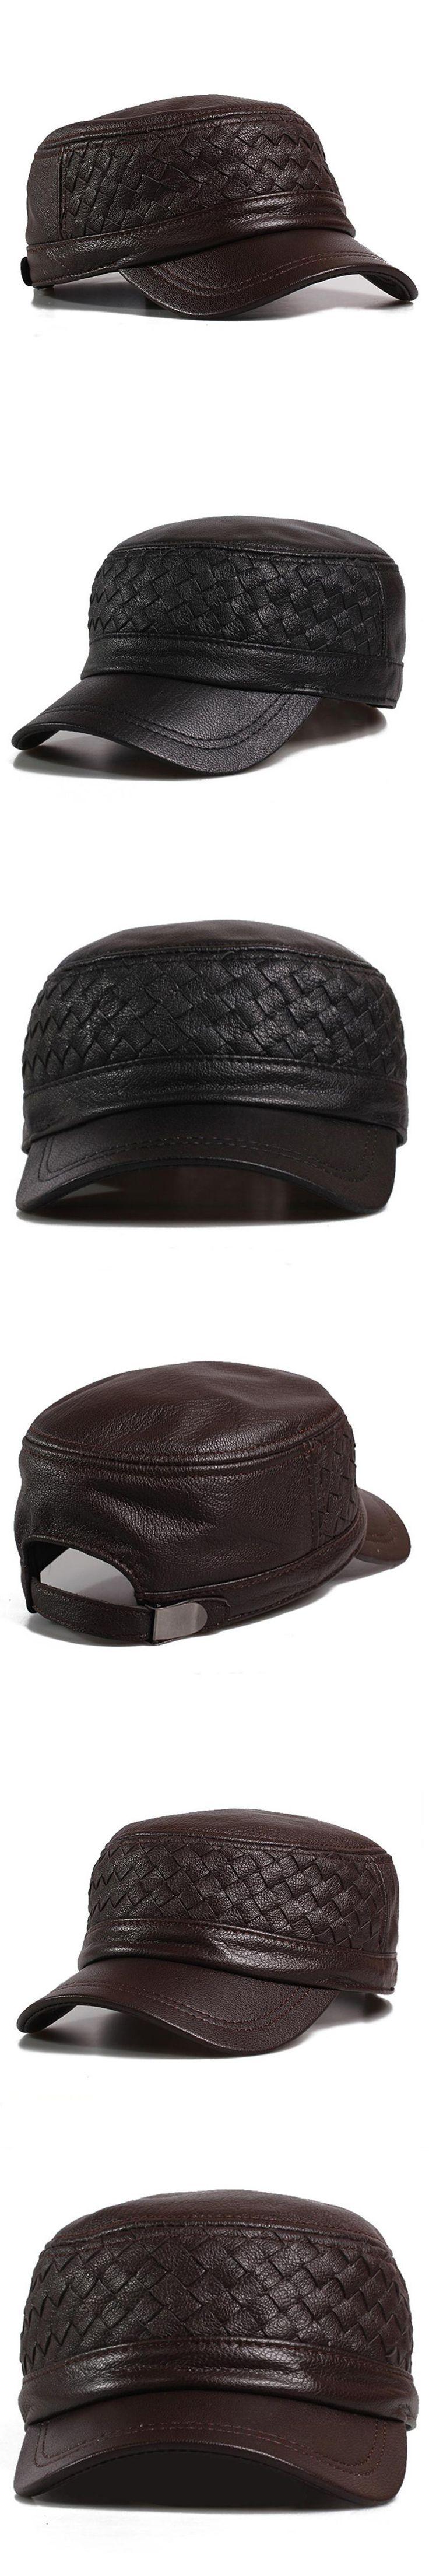 Svadilfari 2017 Winter mens leather cap warm hat Military cap with ear flaps russia flat top caps for men casquette